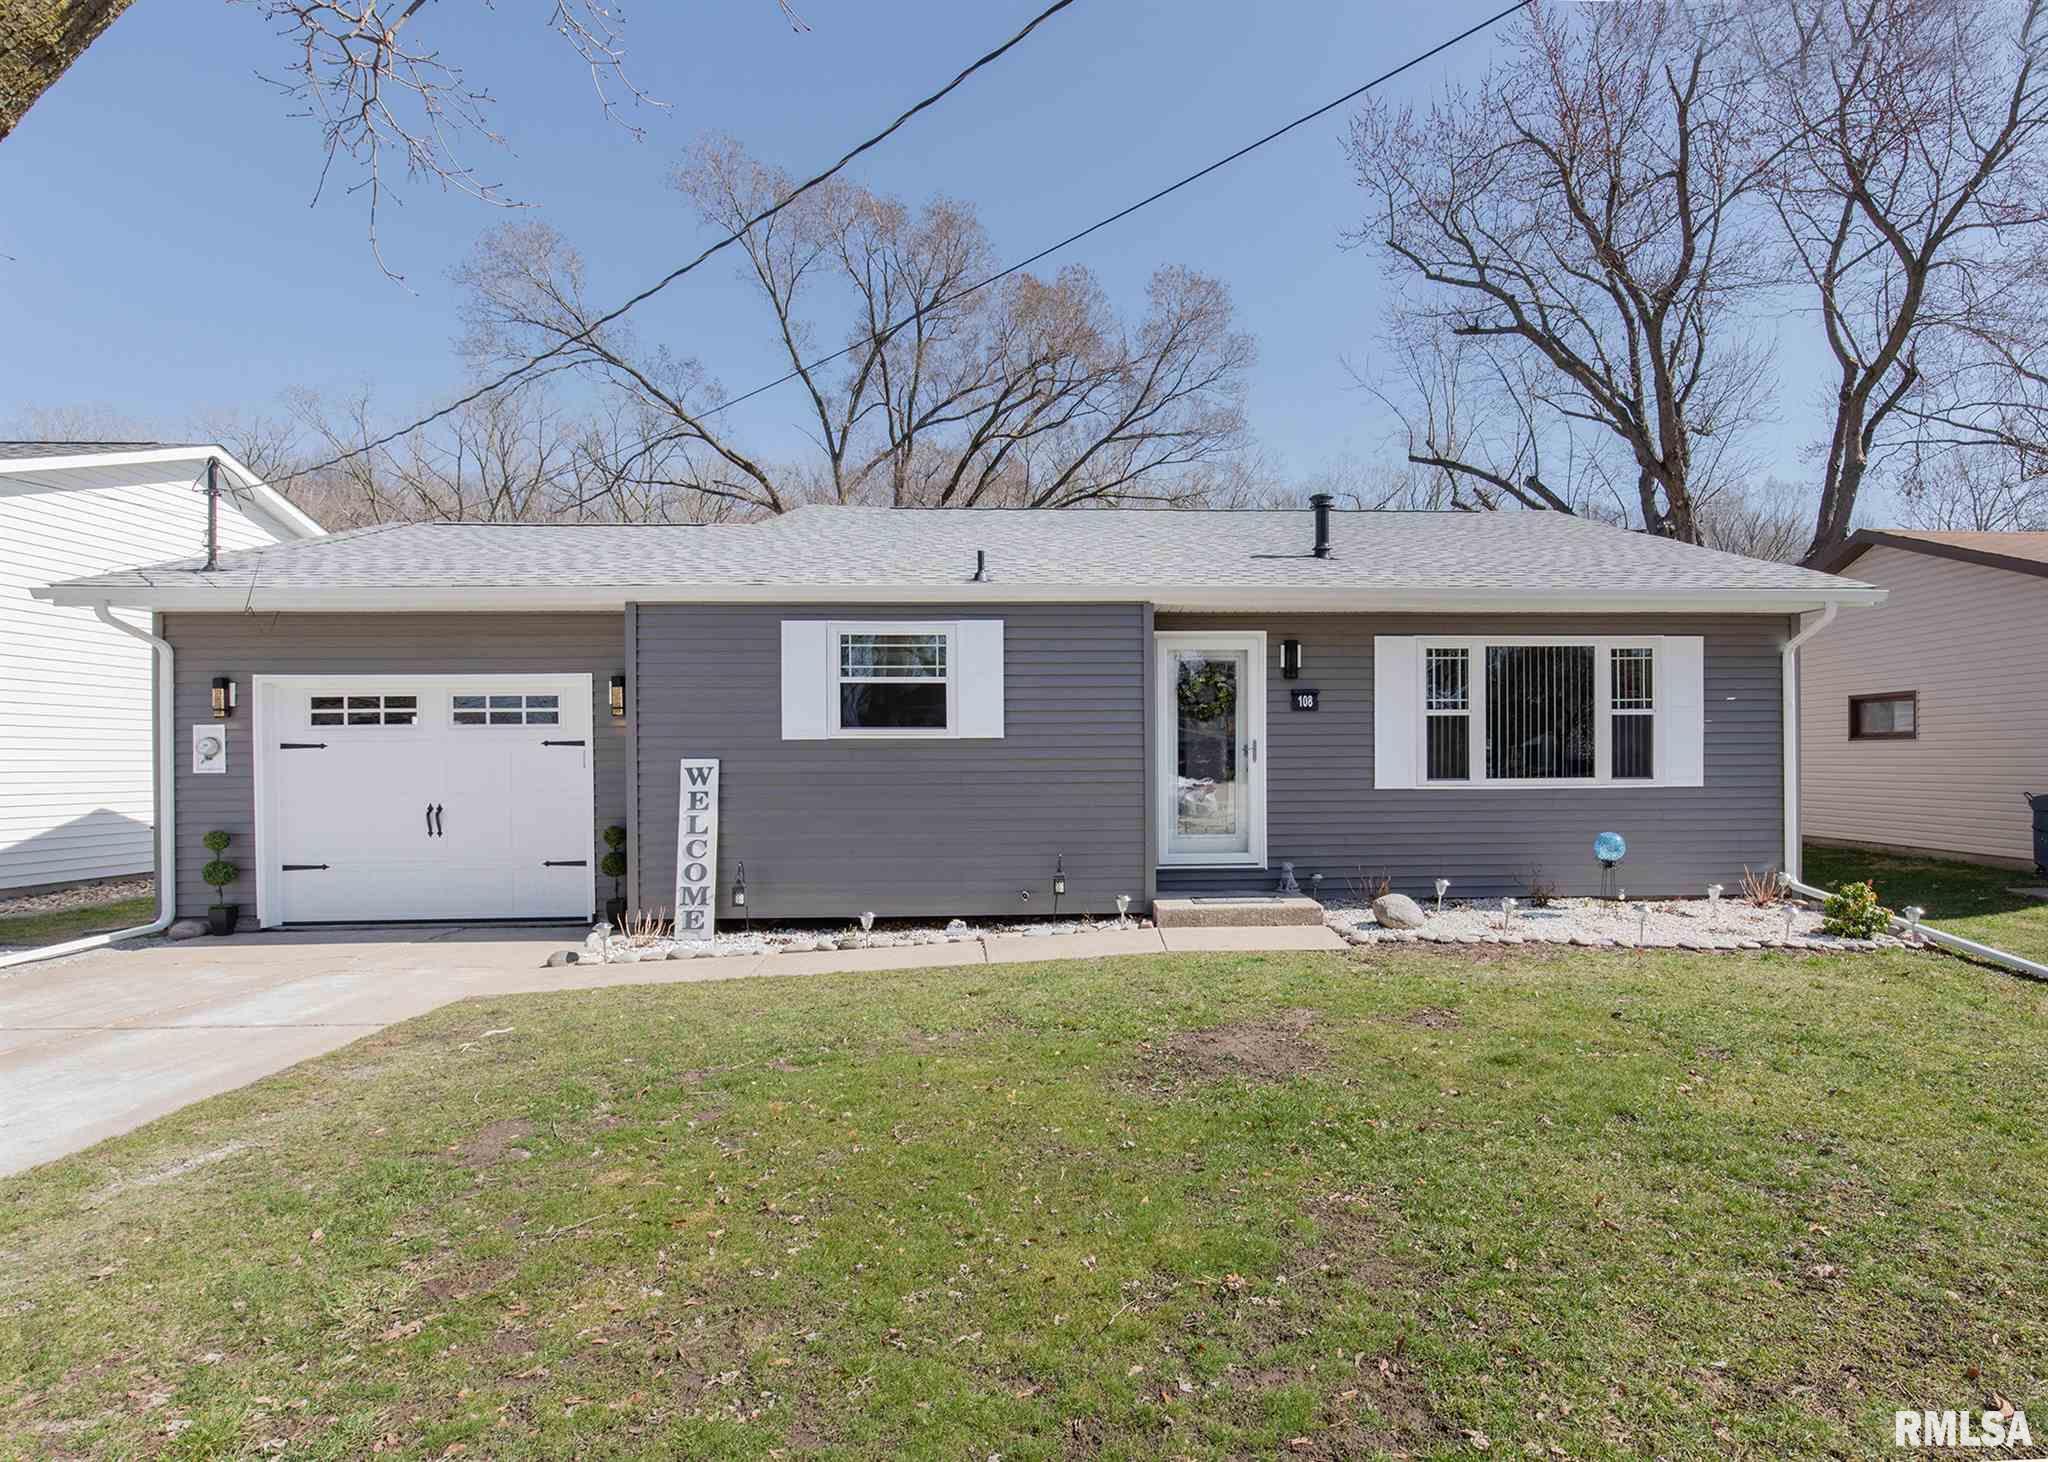 108 3RD Property Photo - Hampton, IL real estate listing